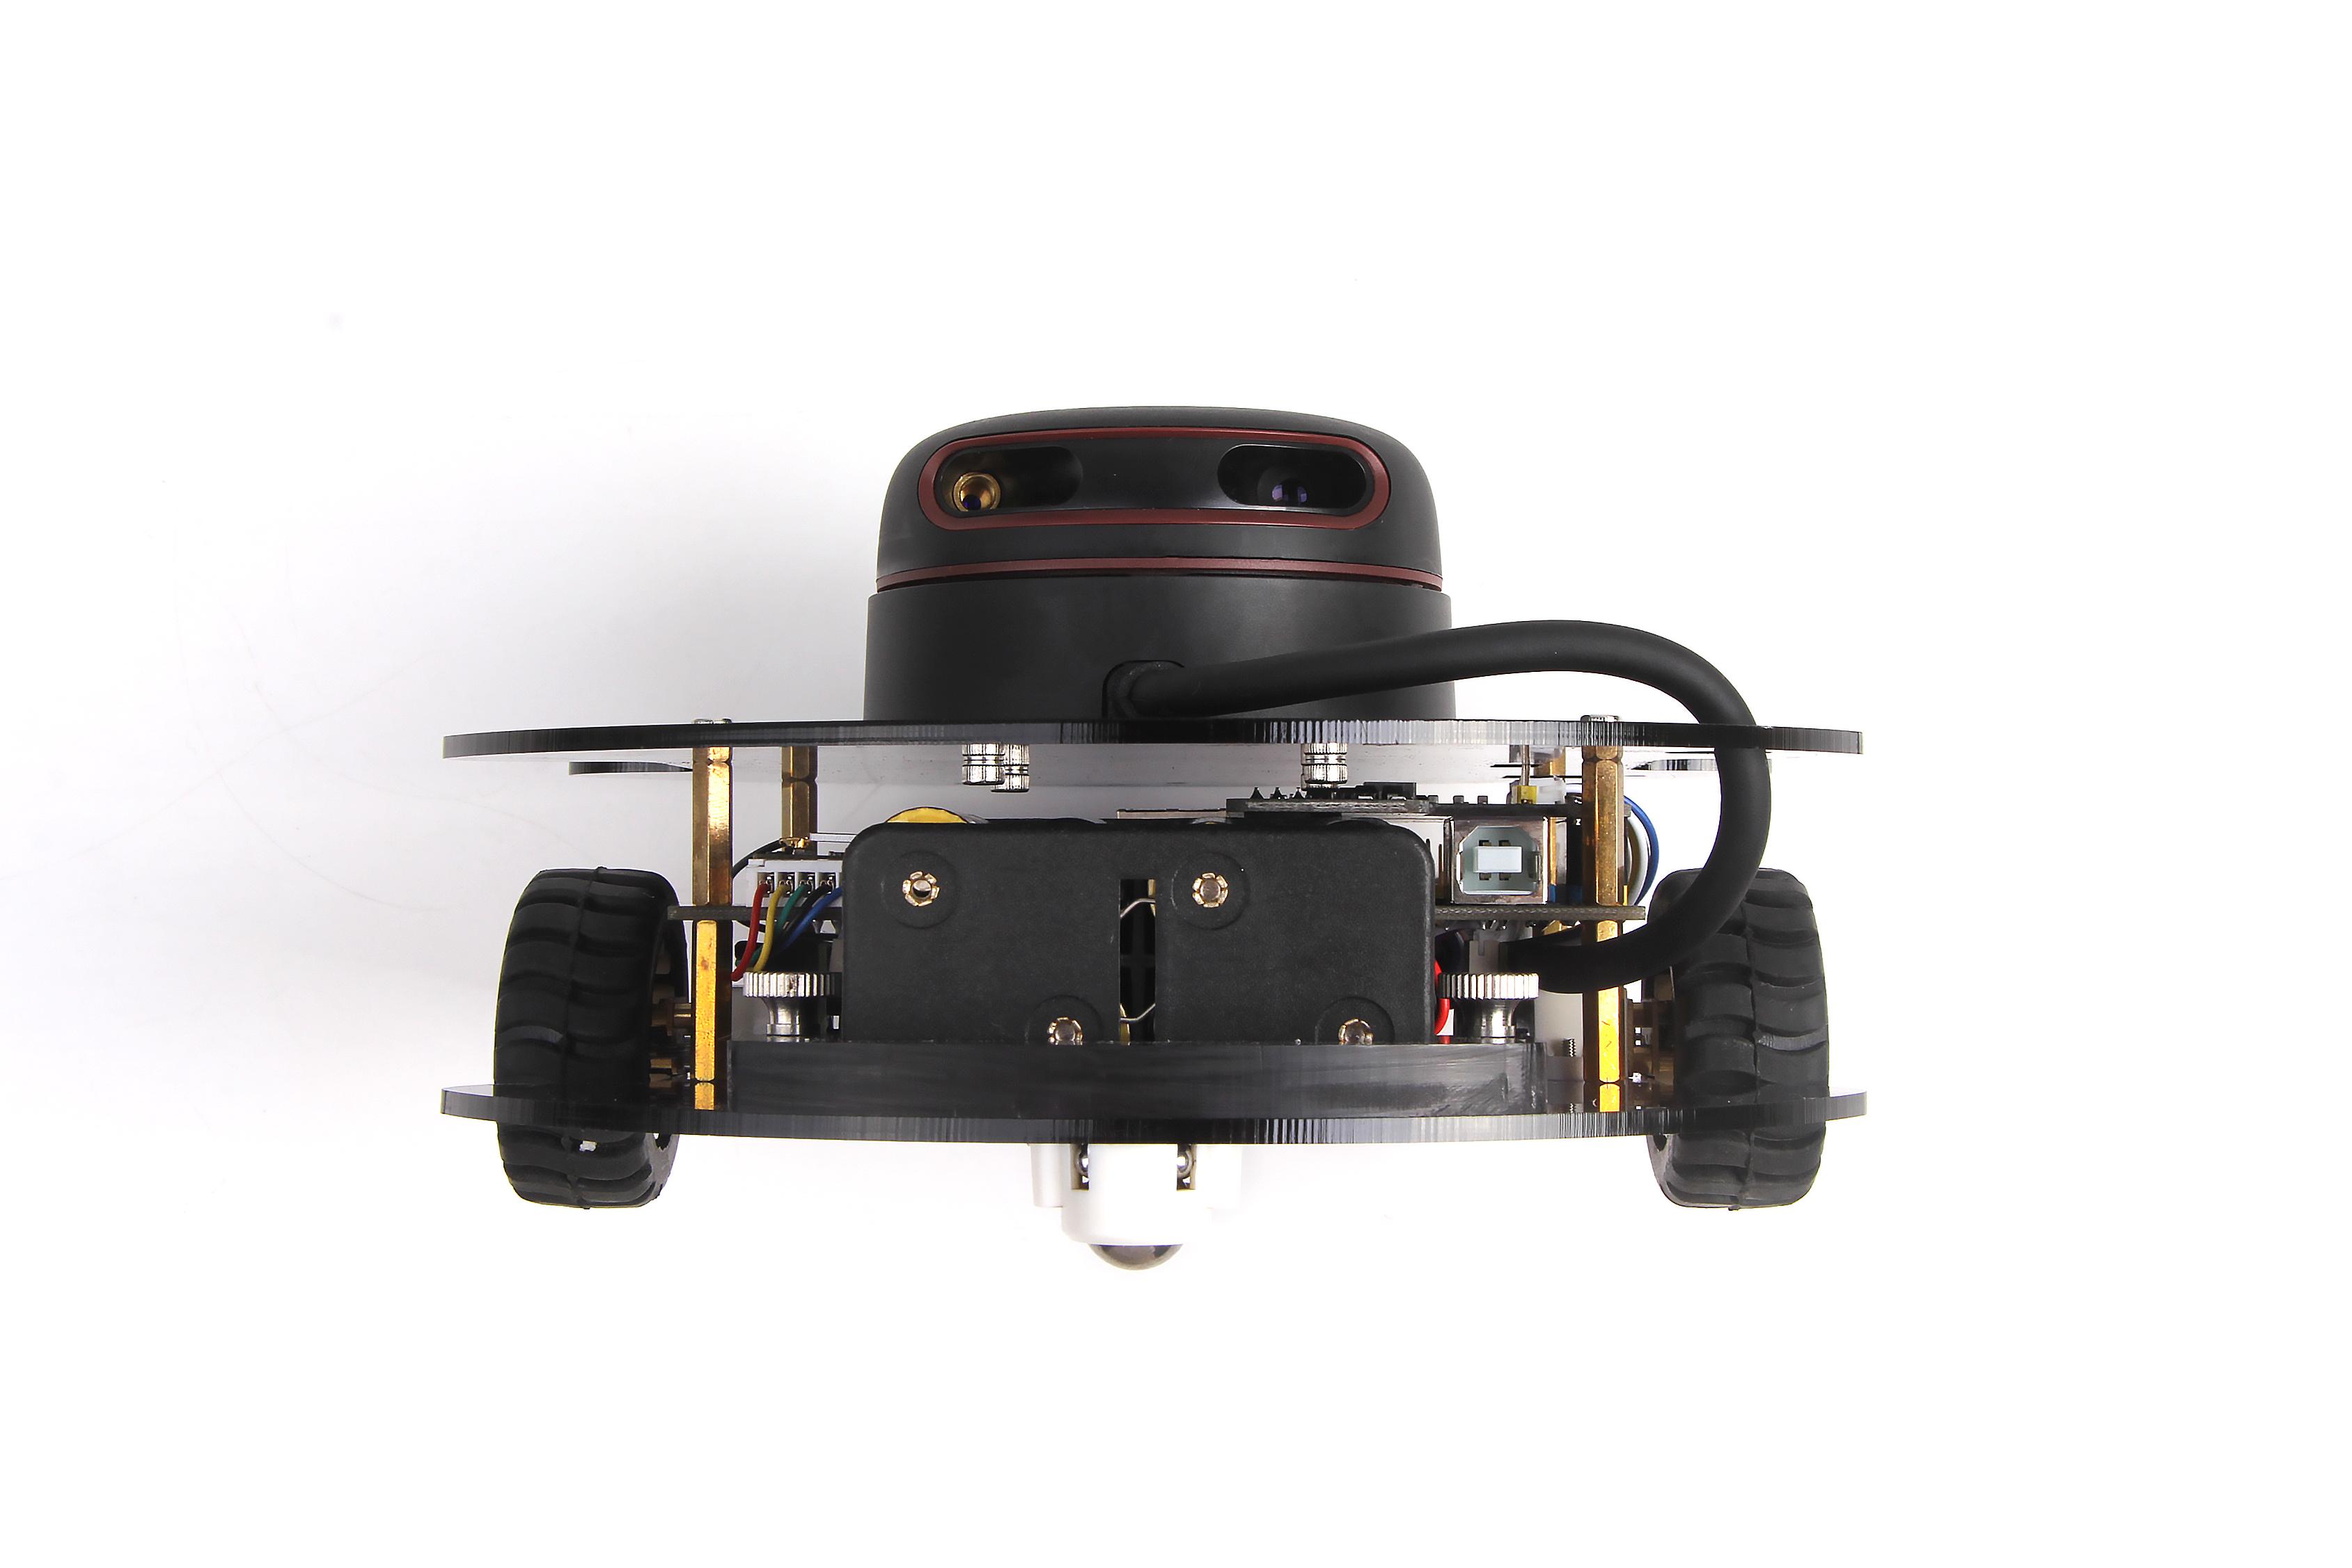 SDP Mini RPlidar Experimental Platform